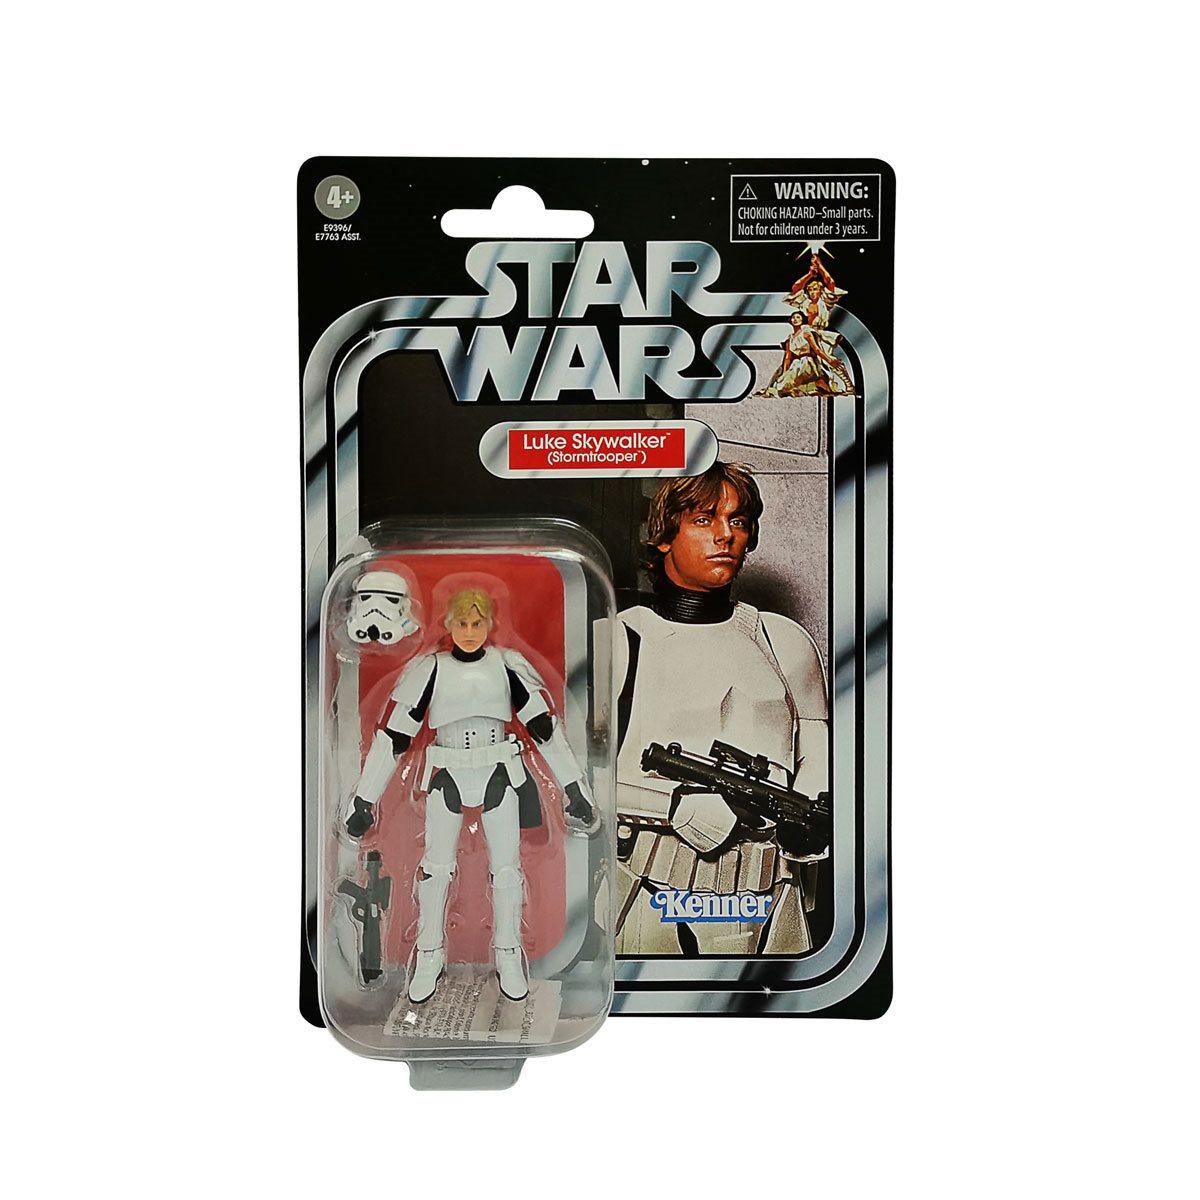 Star Wars The Vintage Collection Luke Skywalker Stormtrooper Disguise Figure